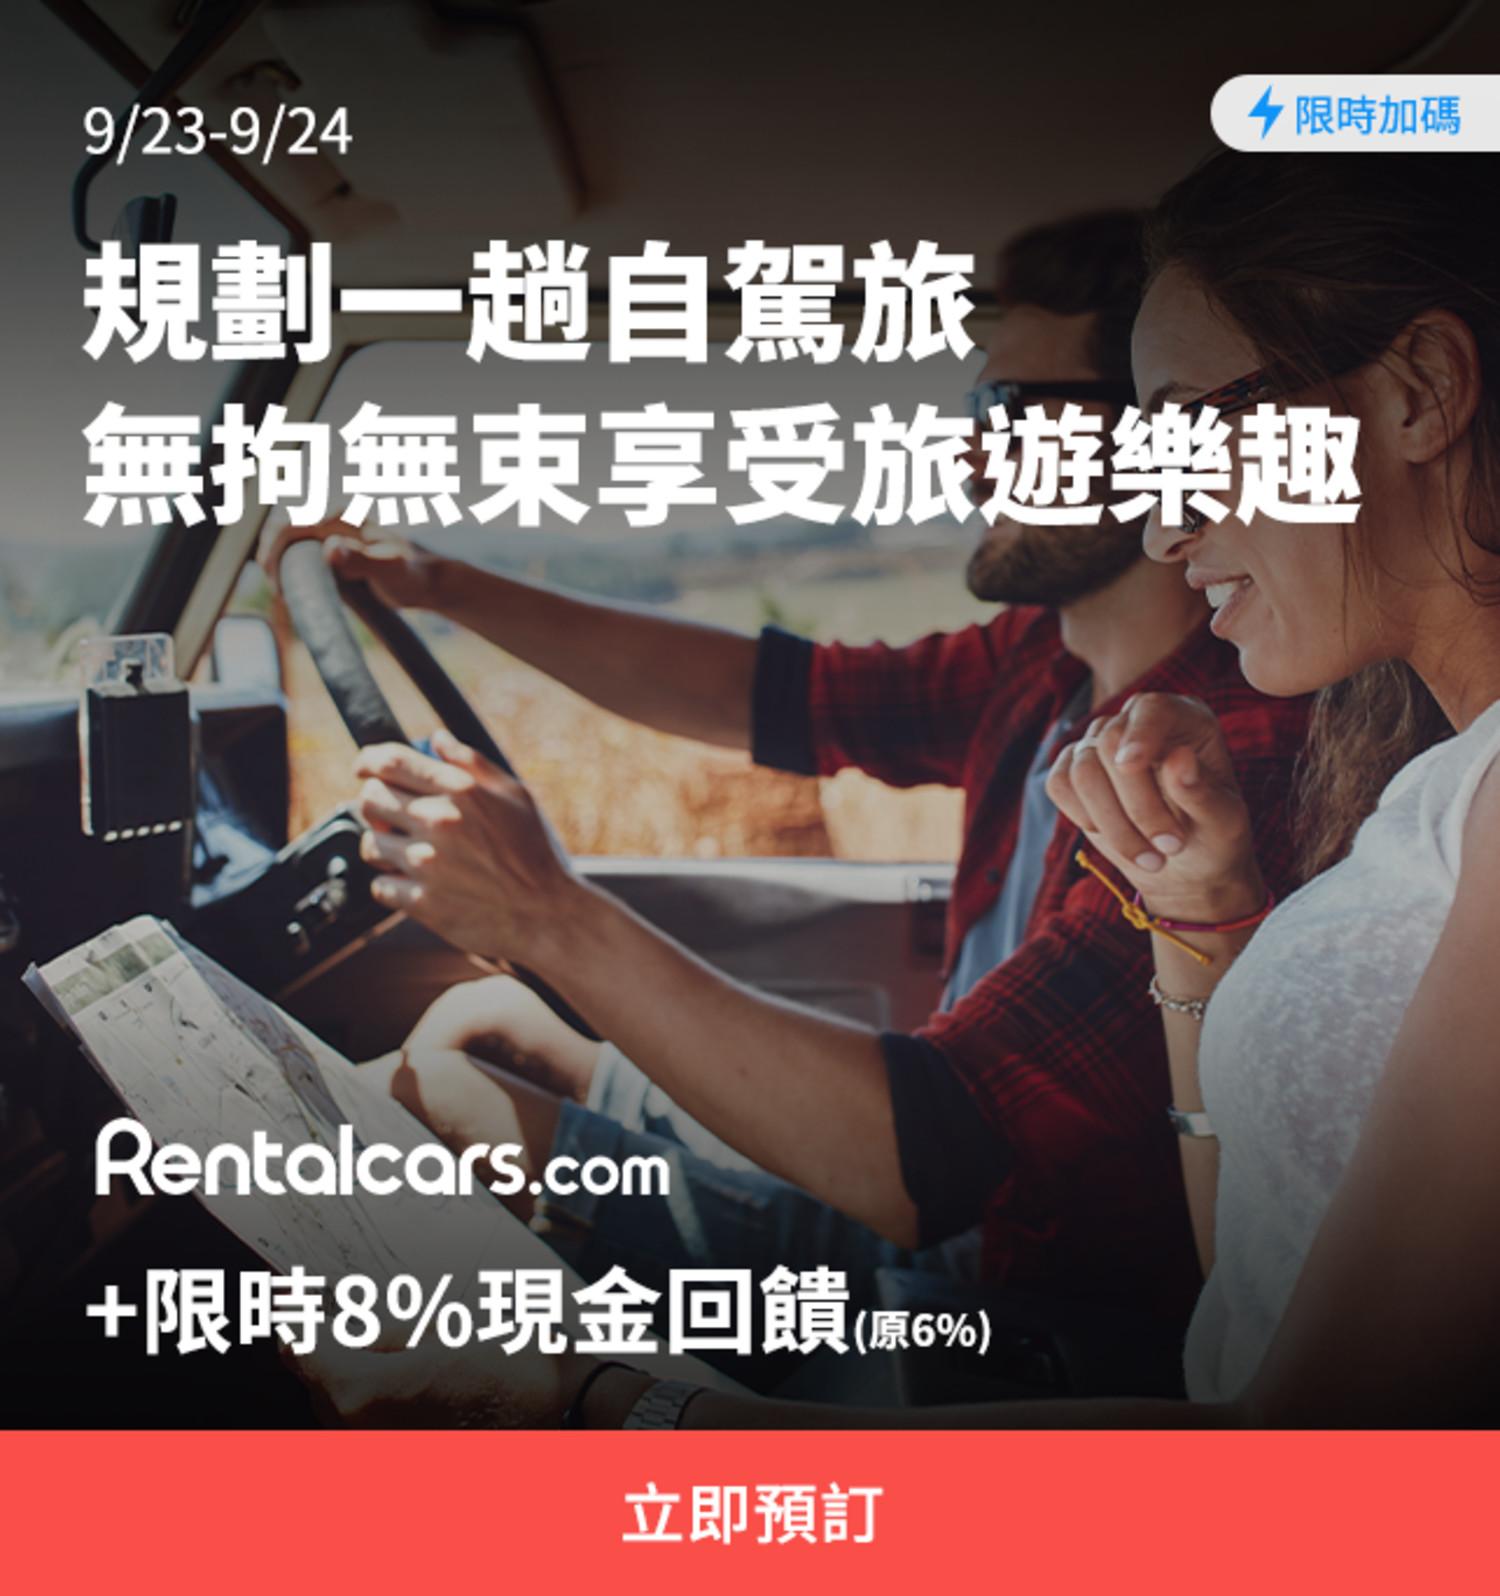 Rentalcars 9/23-9/24 加碼8%